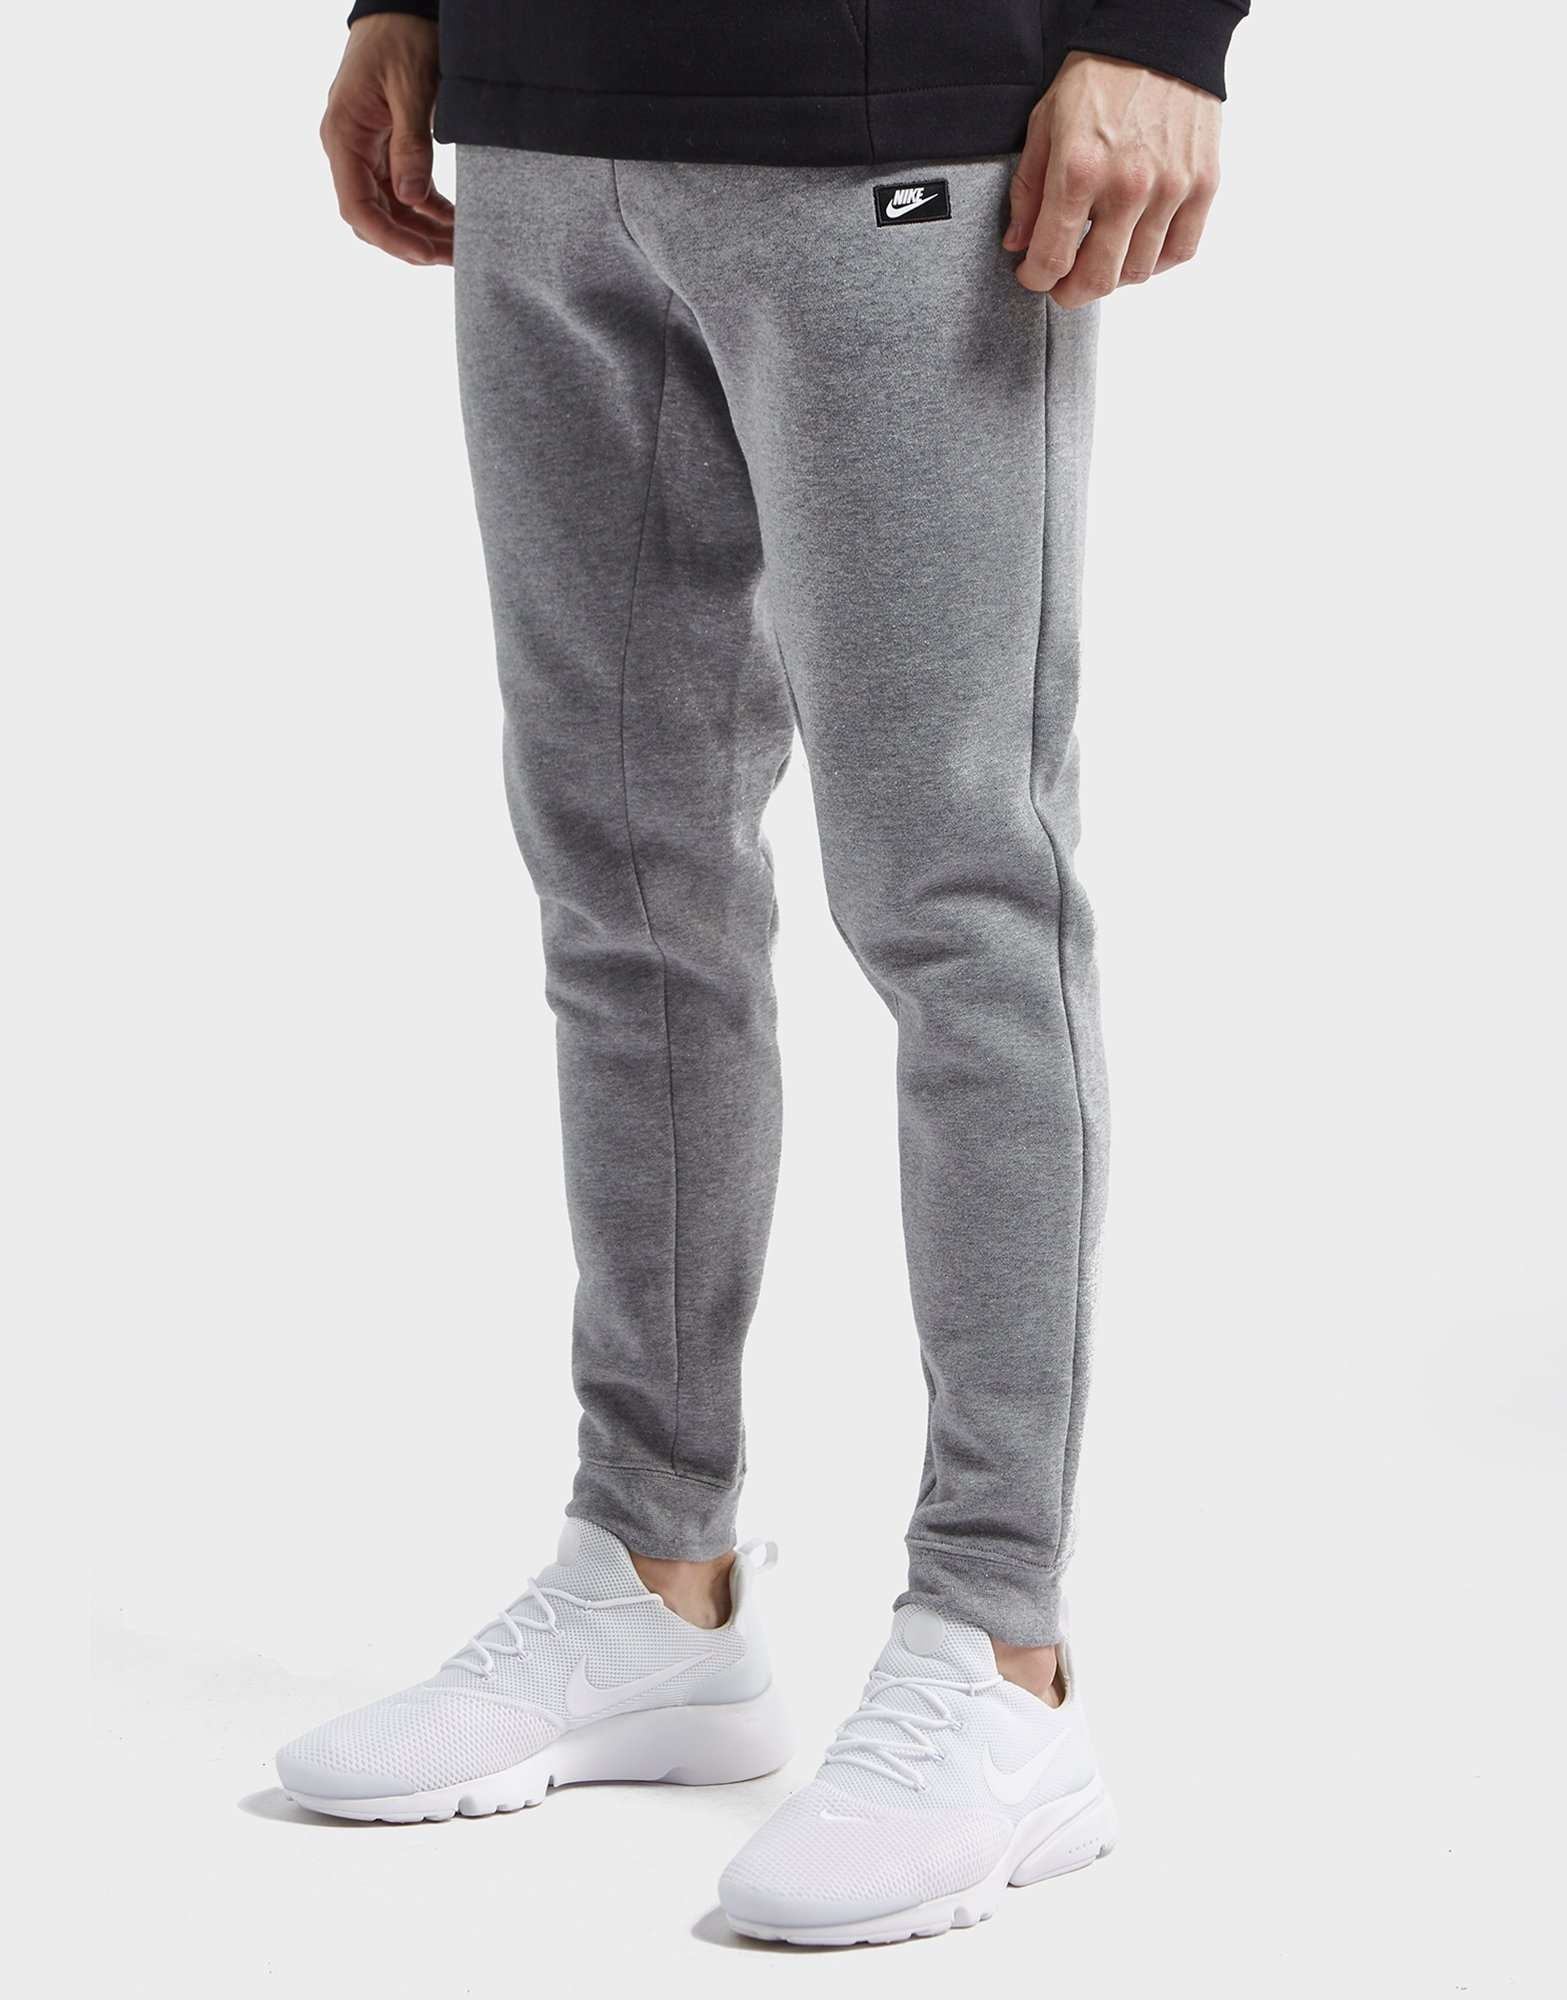 4a38bf184b51 Nike Modern Fleece Pants